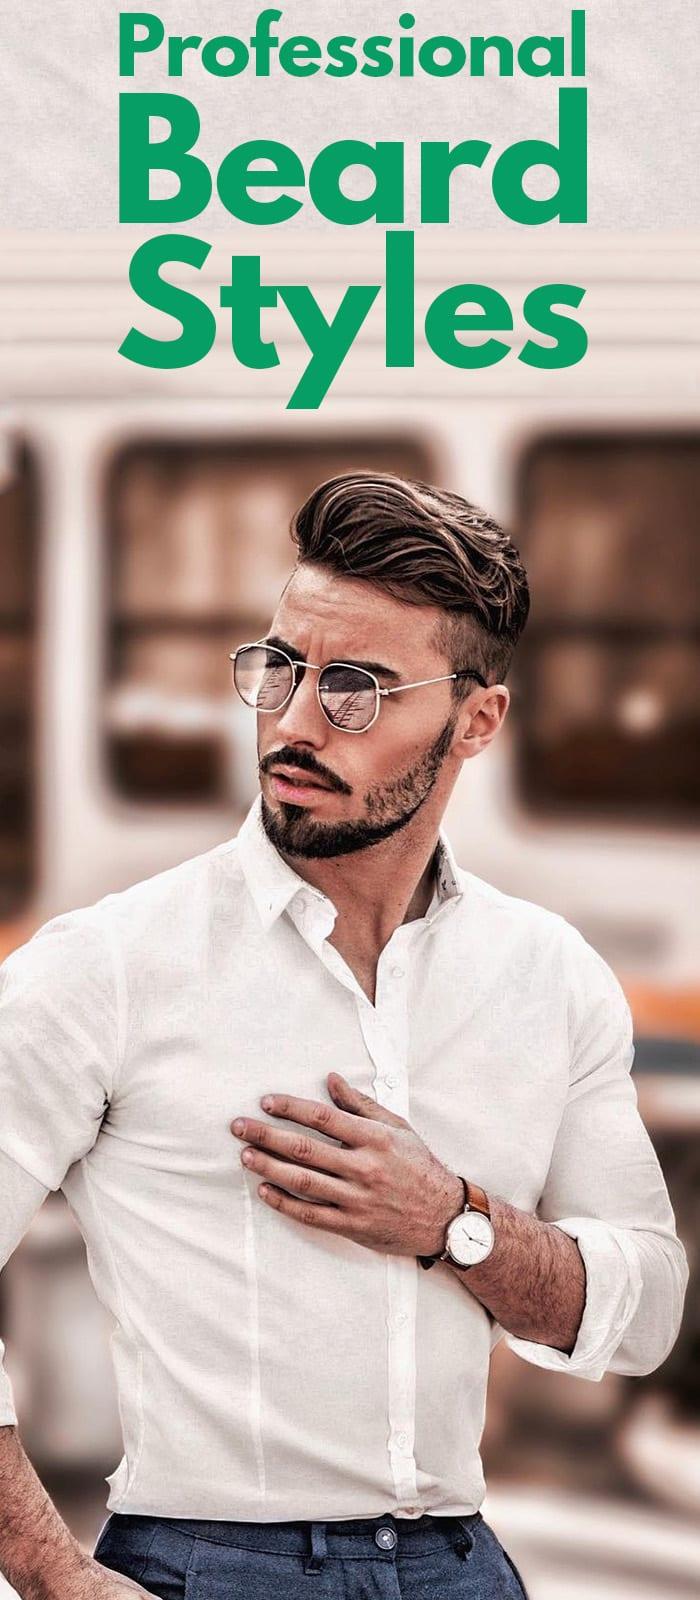 Professional Beard Styles.